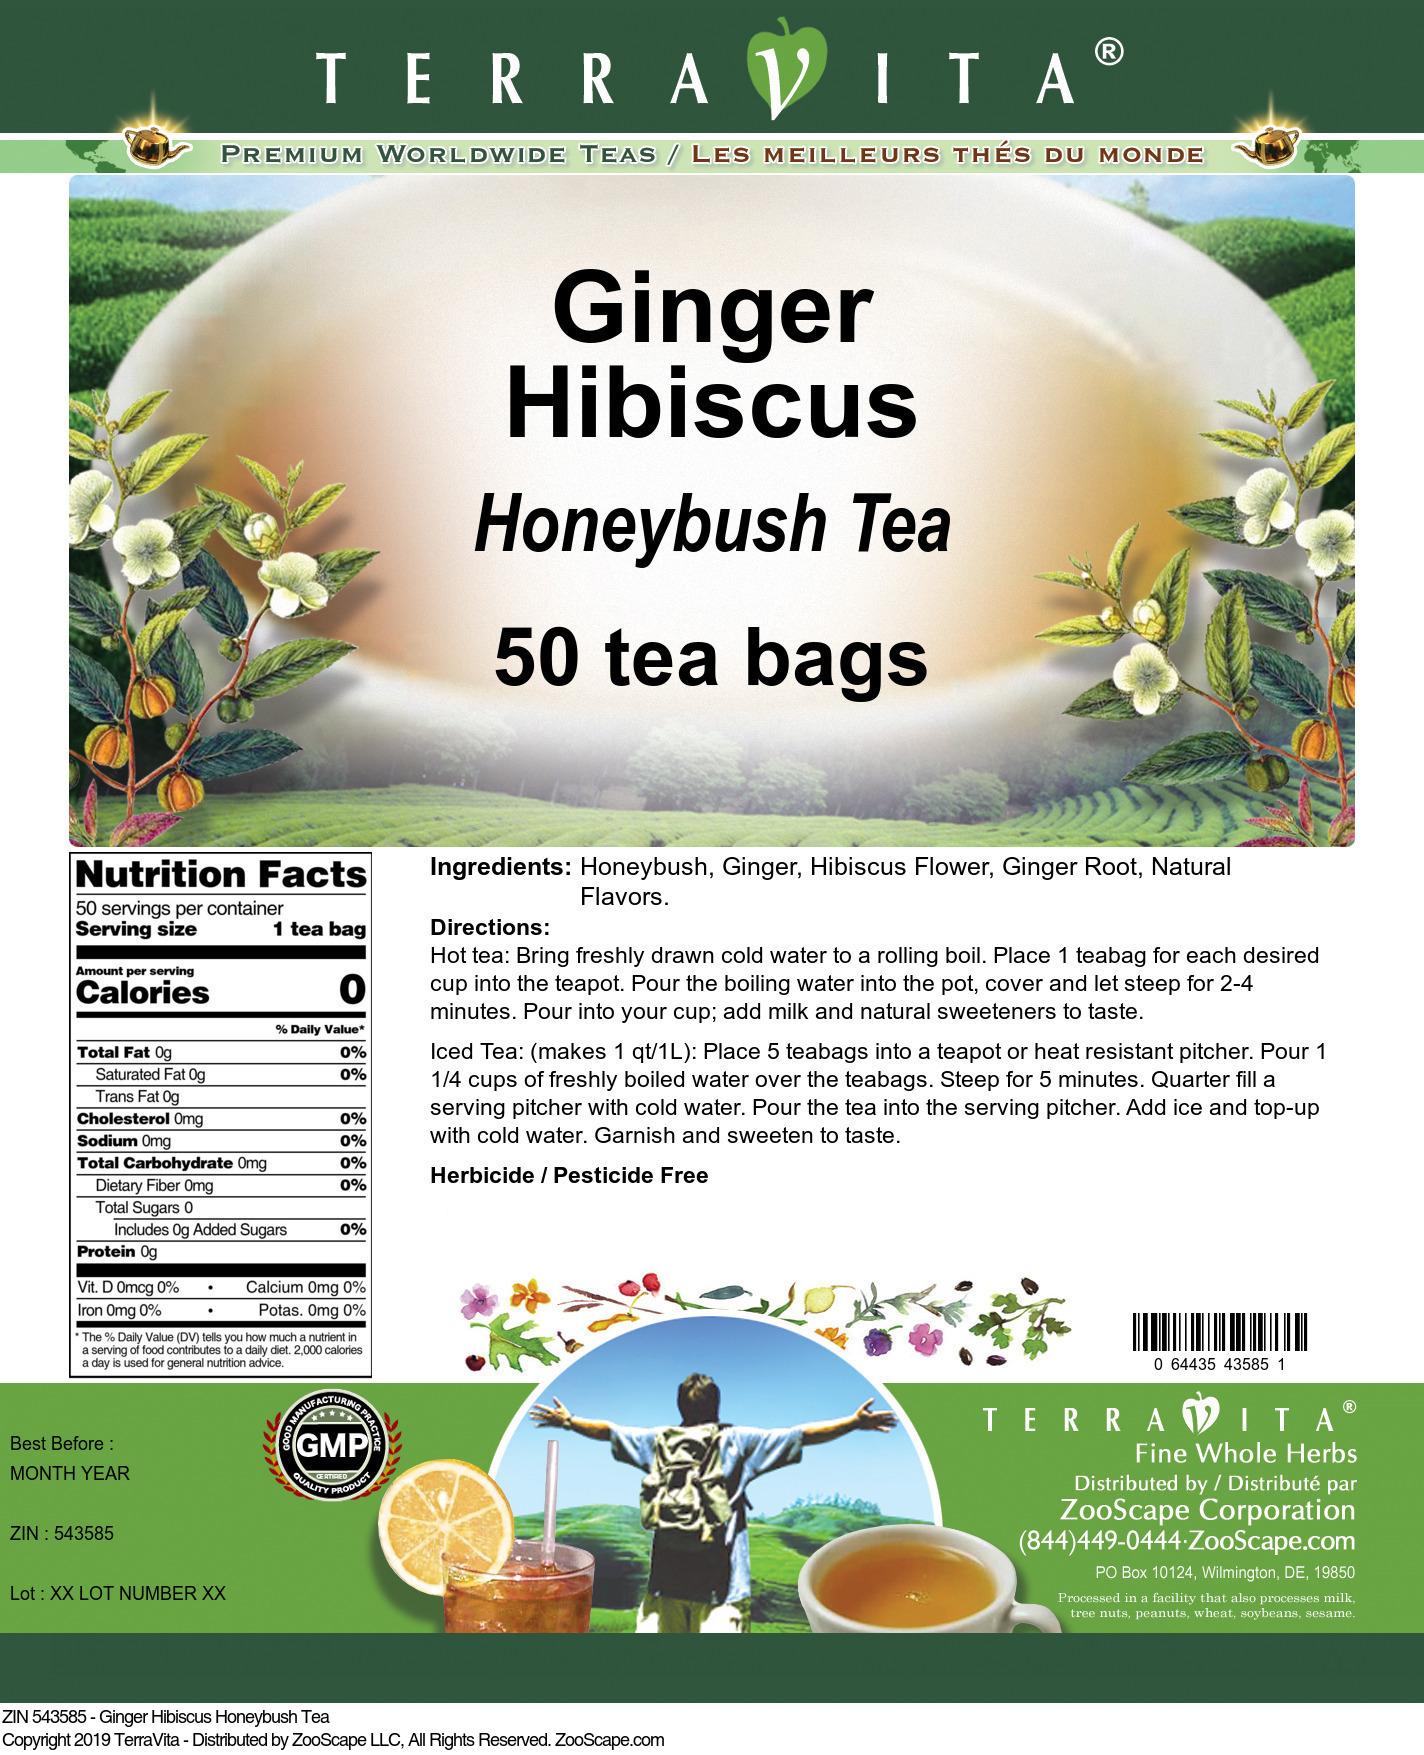 Ginger Hibiscus Honeybush Tea